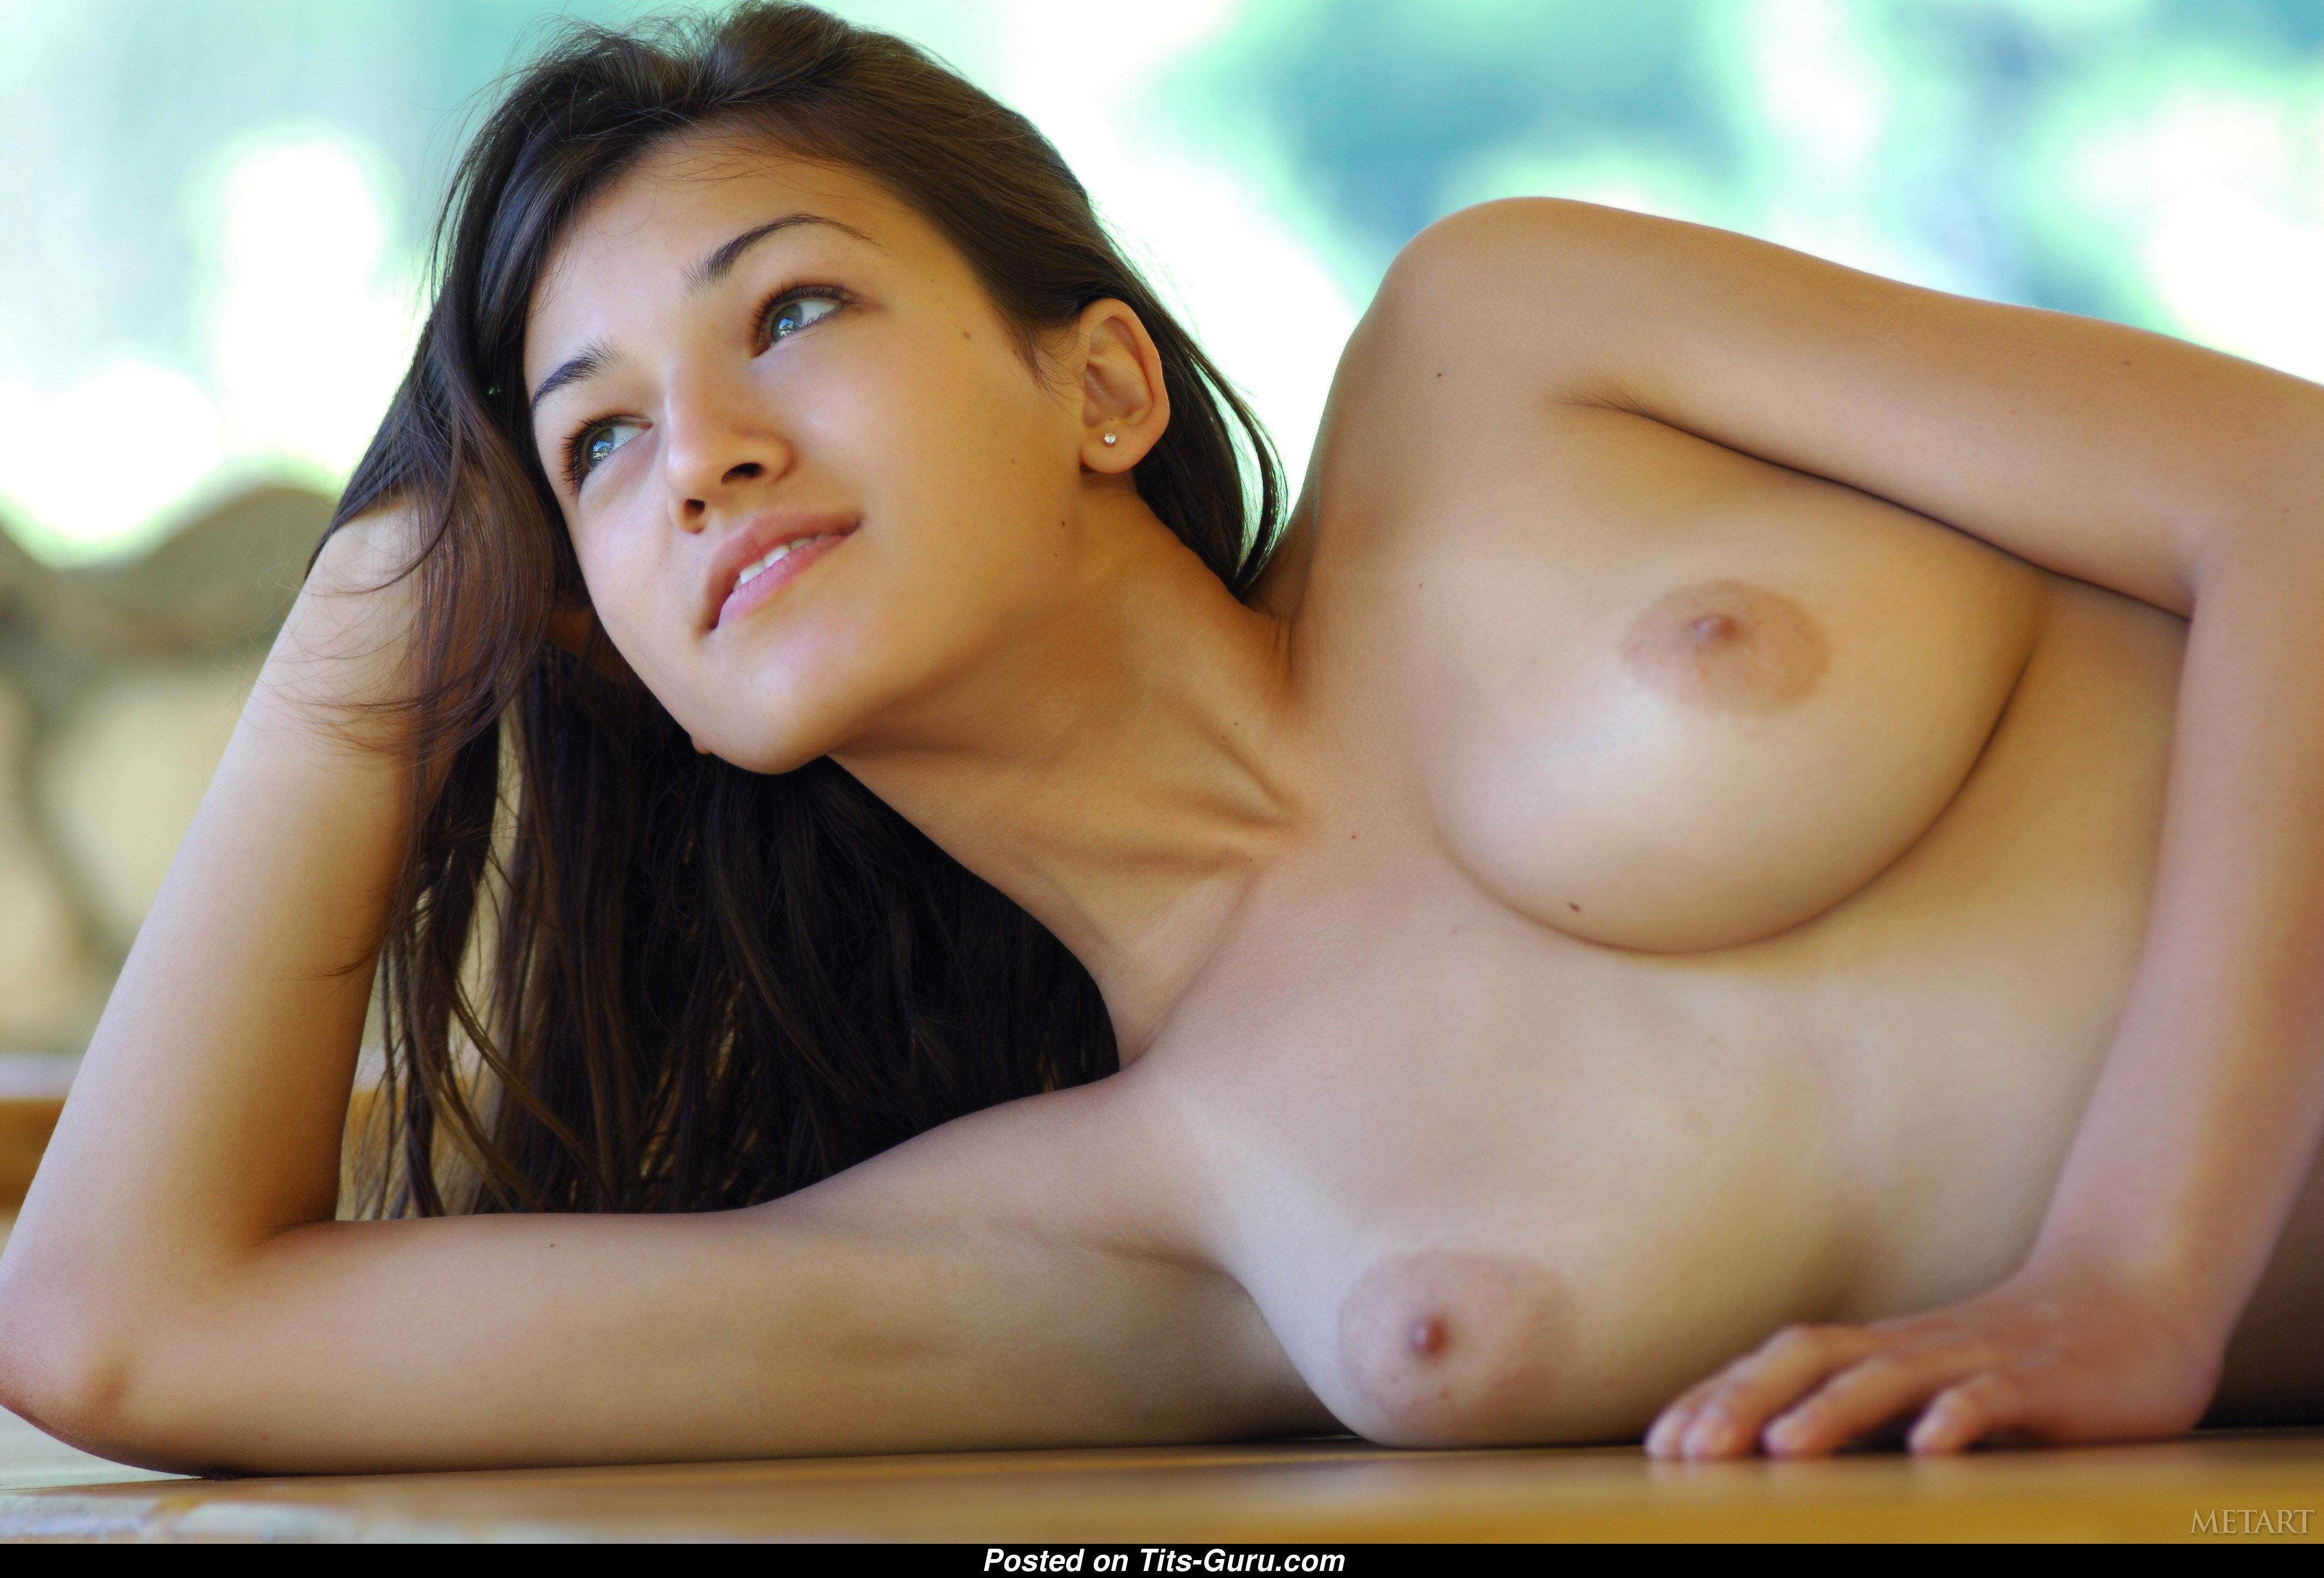 Naked people girls